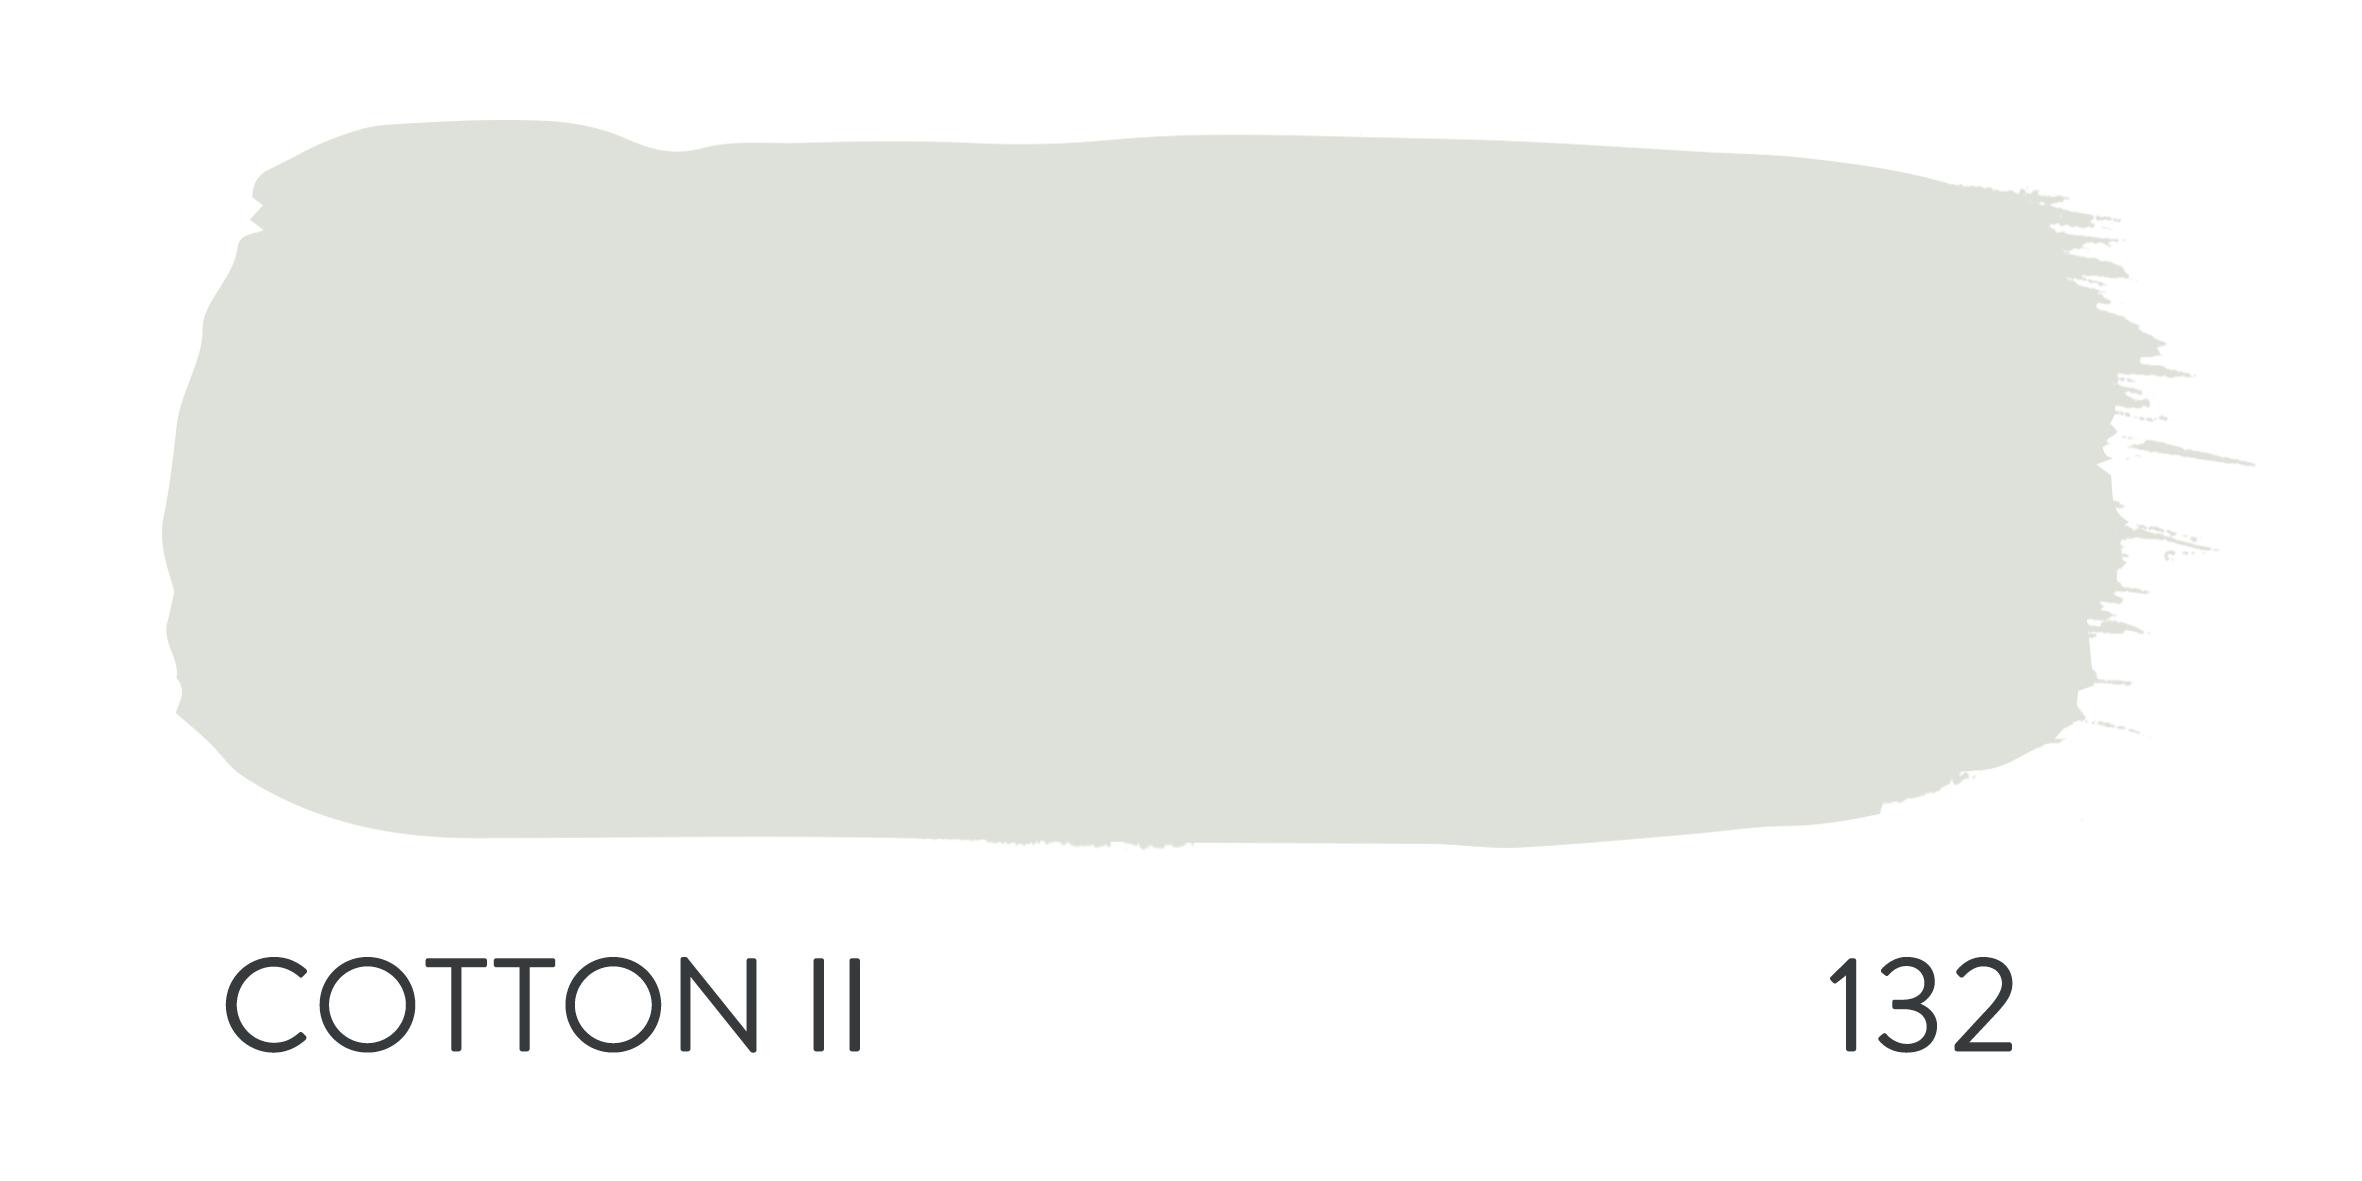 COTTON II 132.jpg